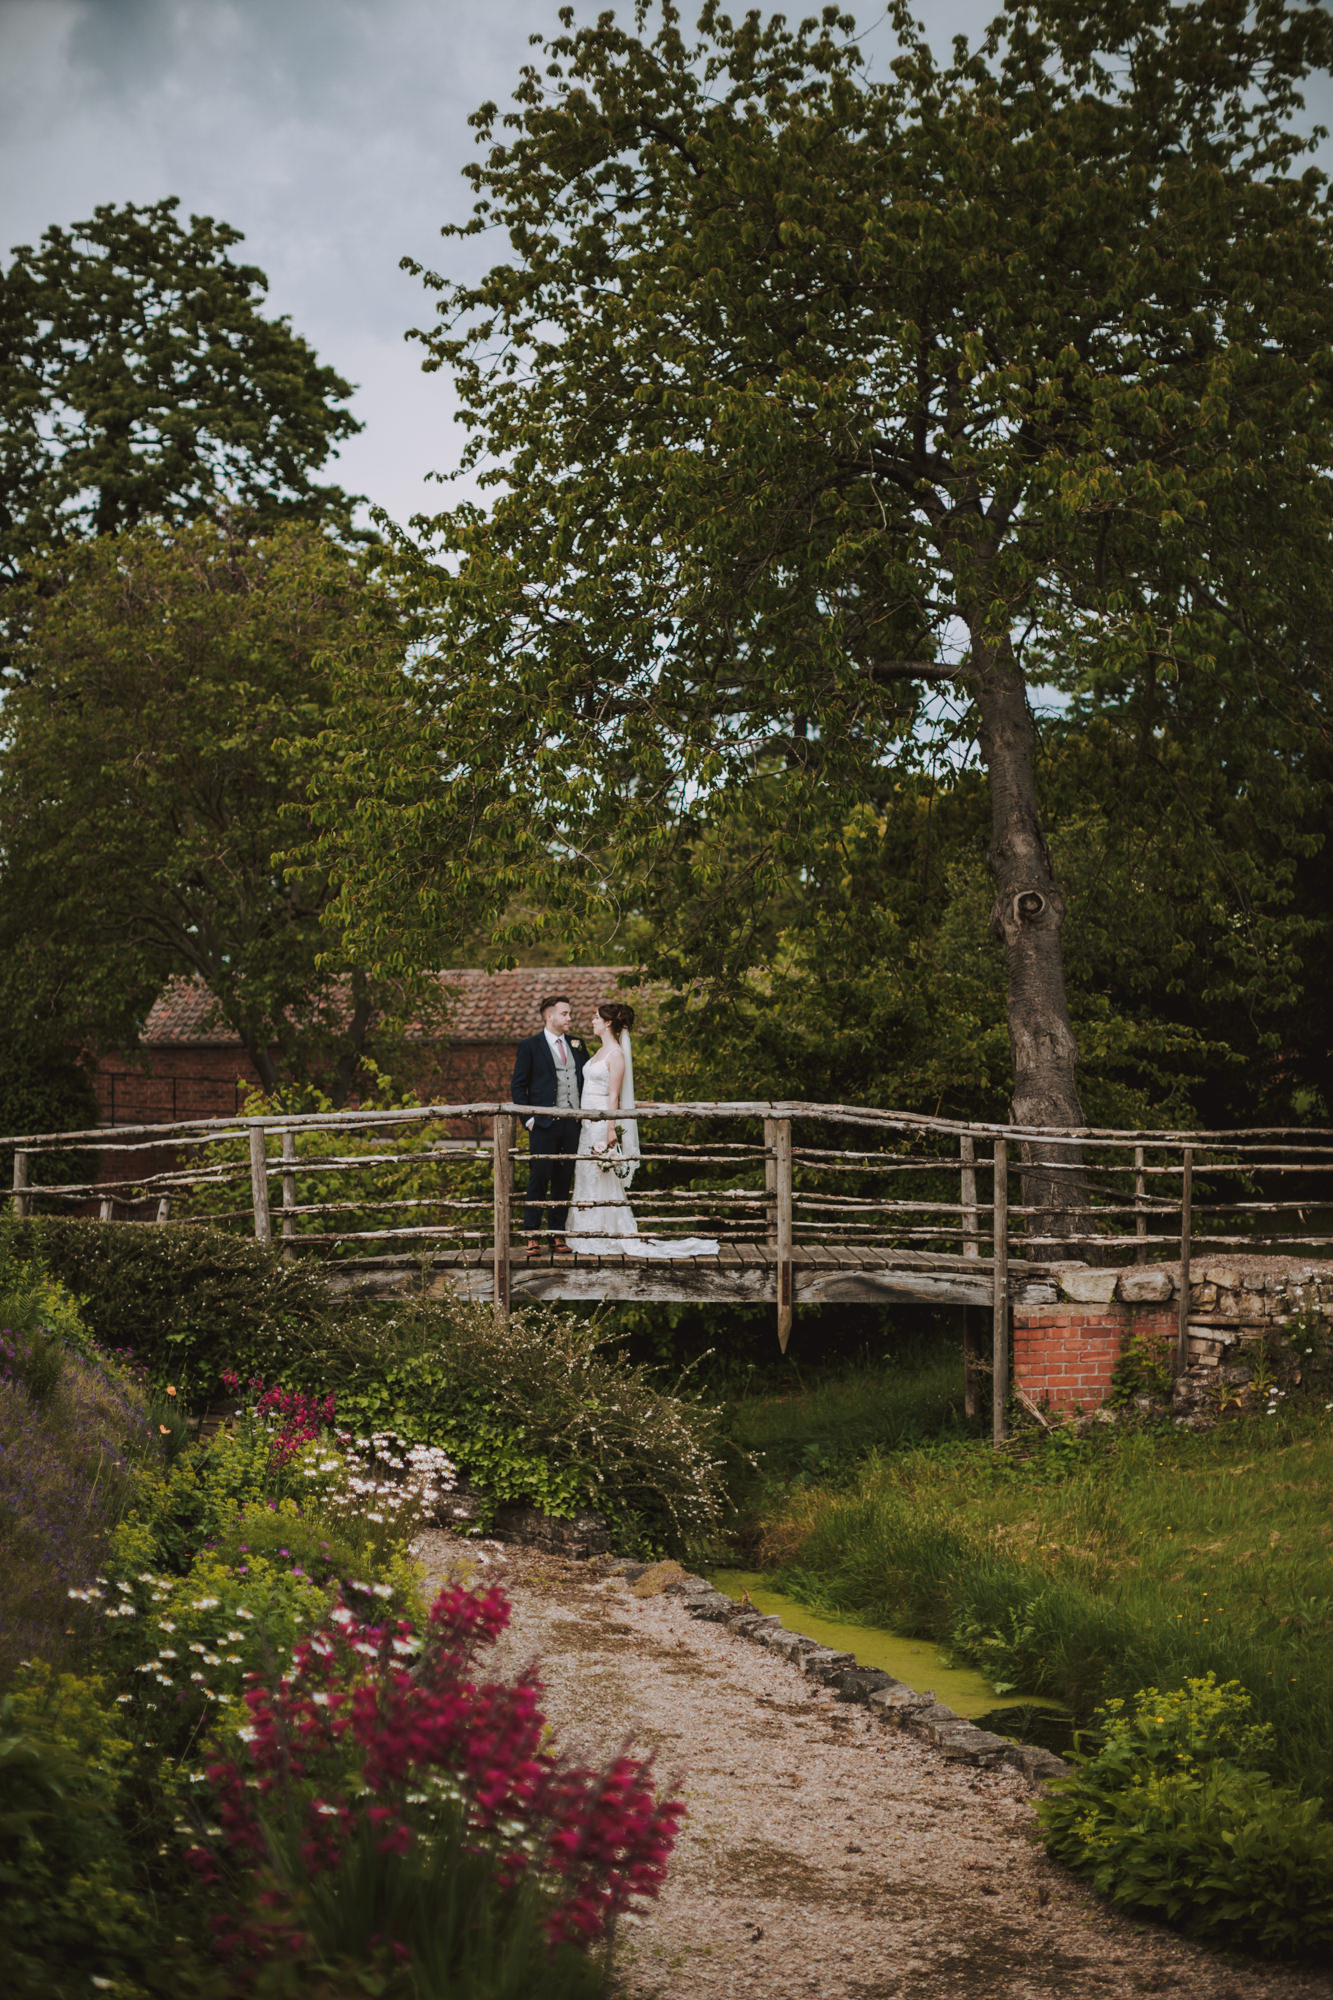 hodsock priory wedding photographers blog65.jpg